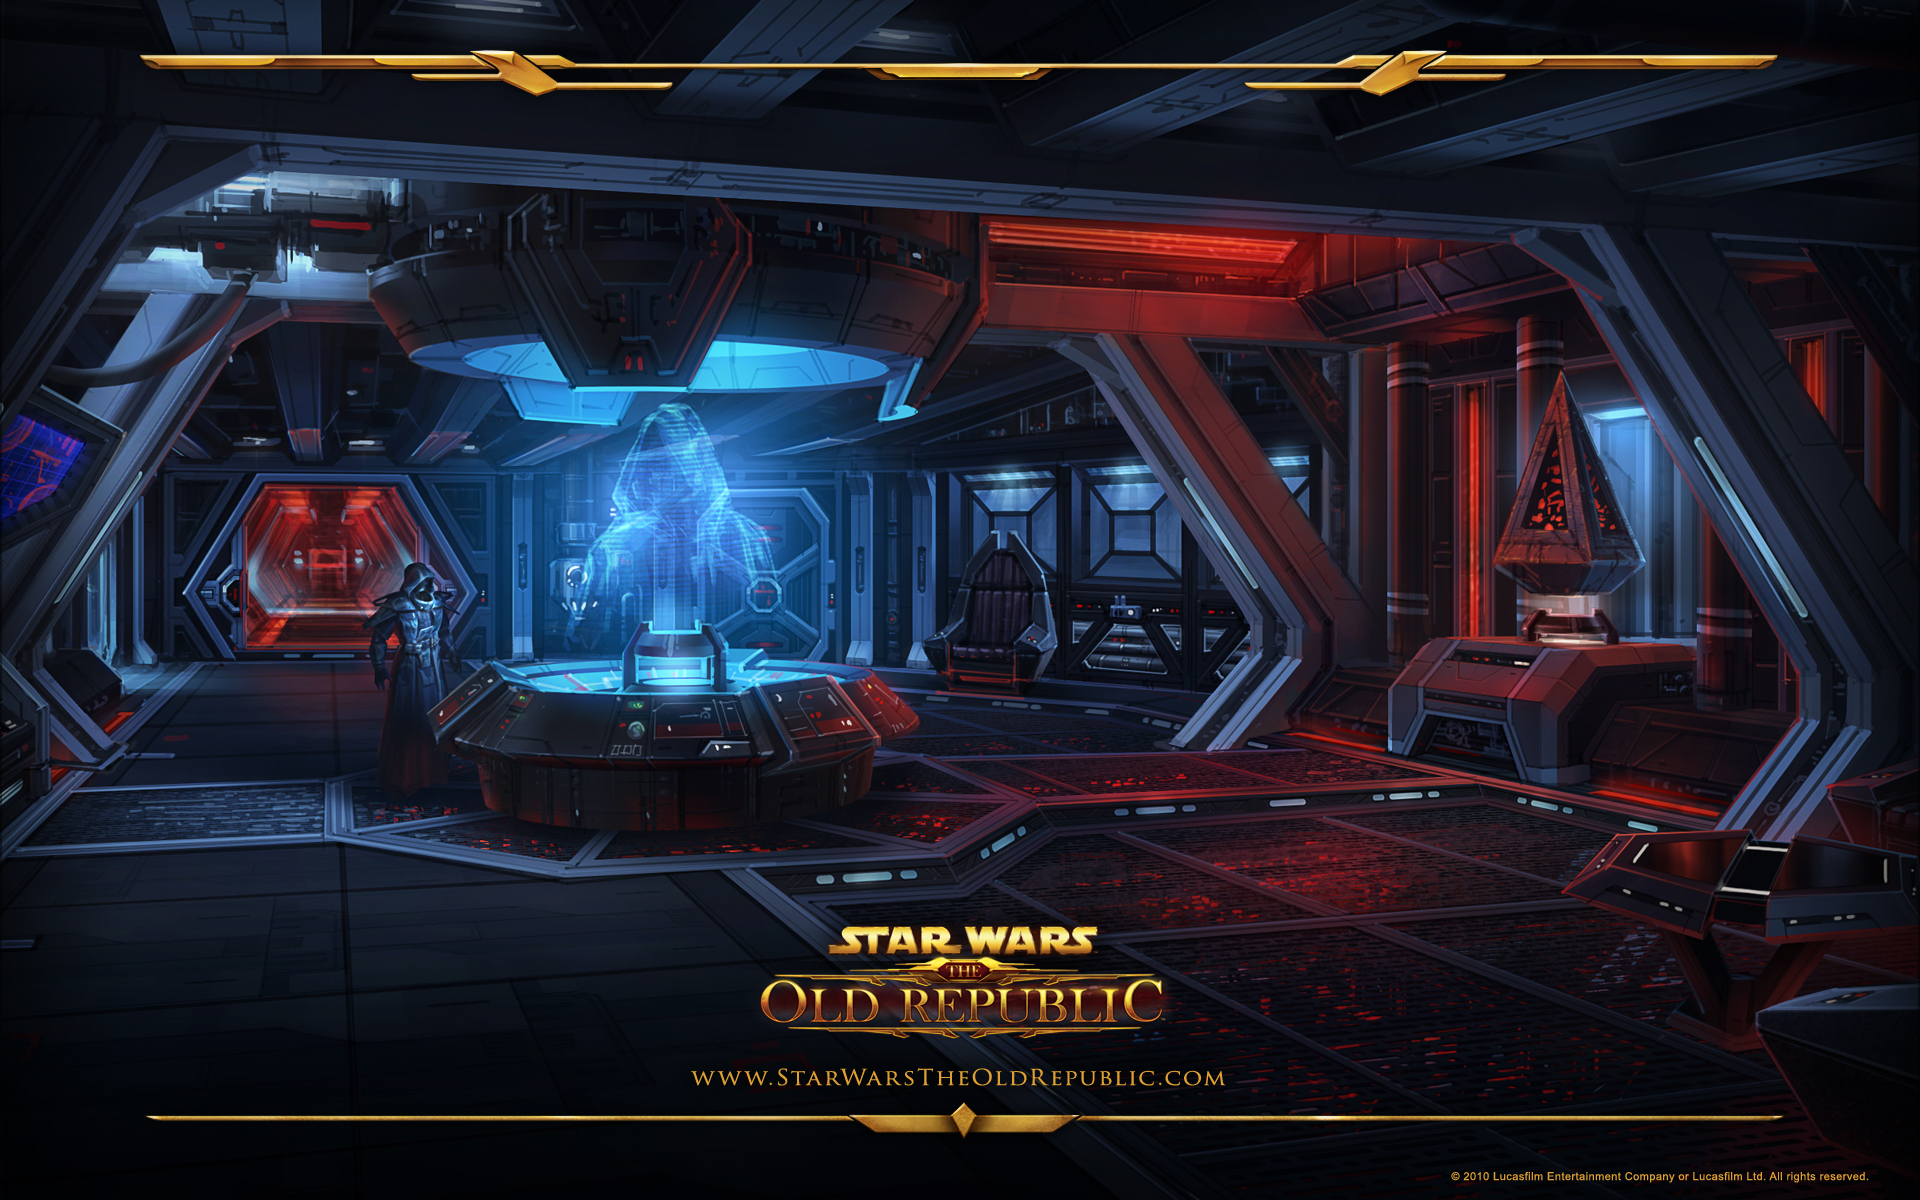 Sith EmpireSith Empire